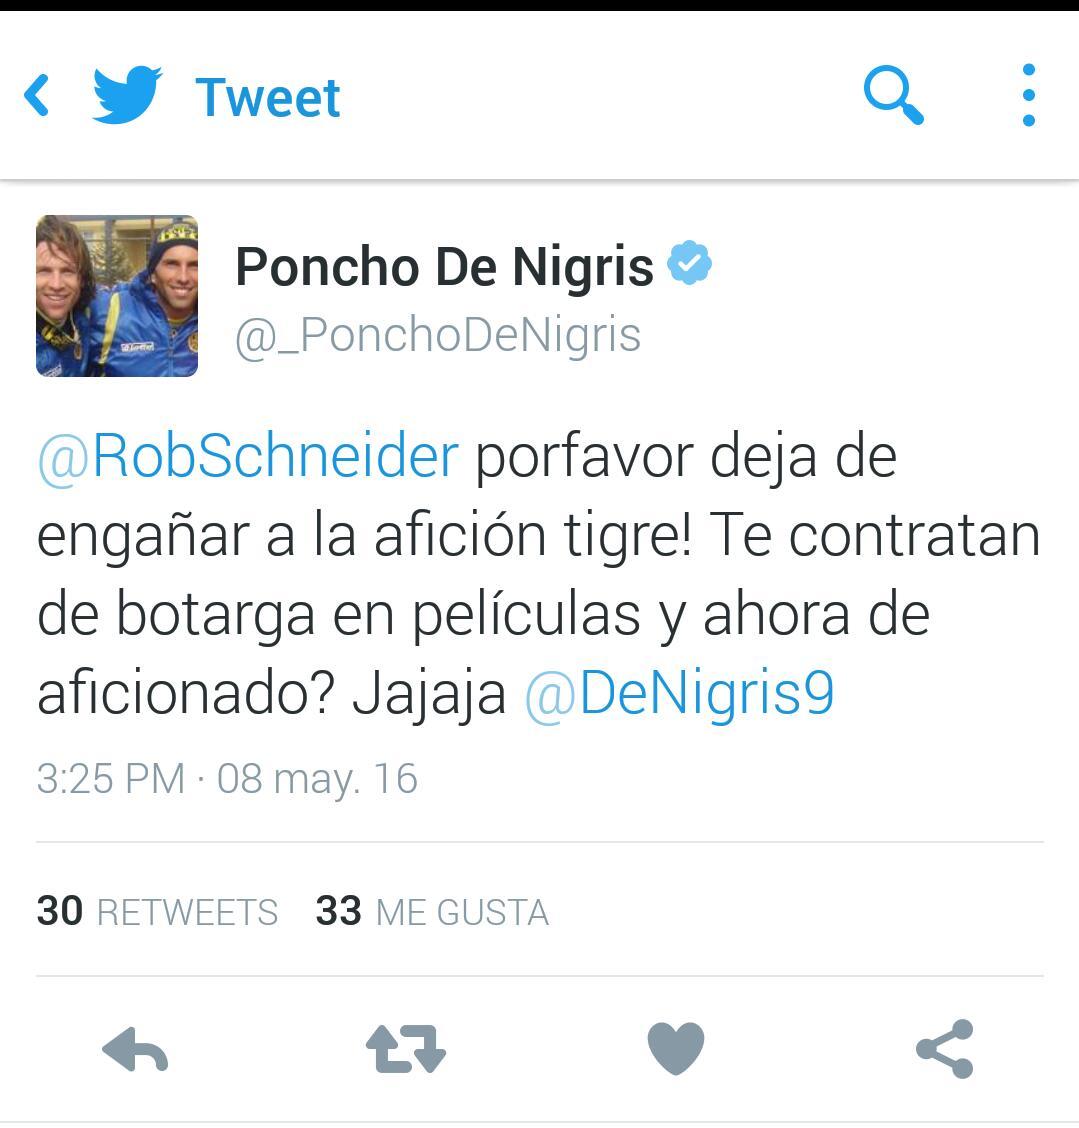 PONCHO DE NIGRIS tuit 2